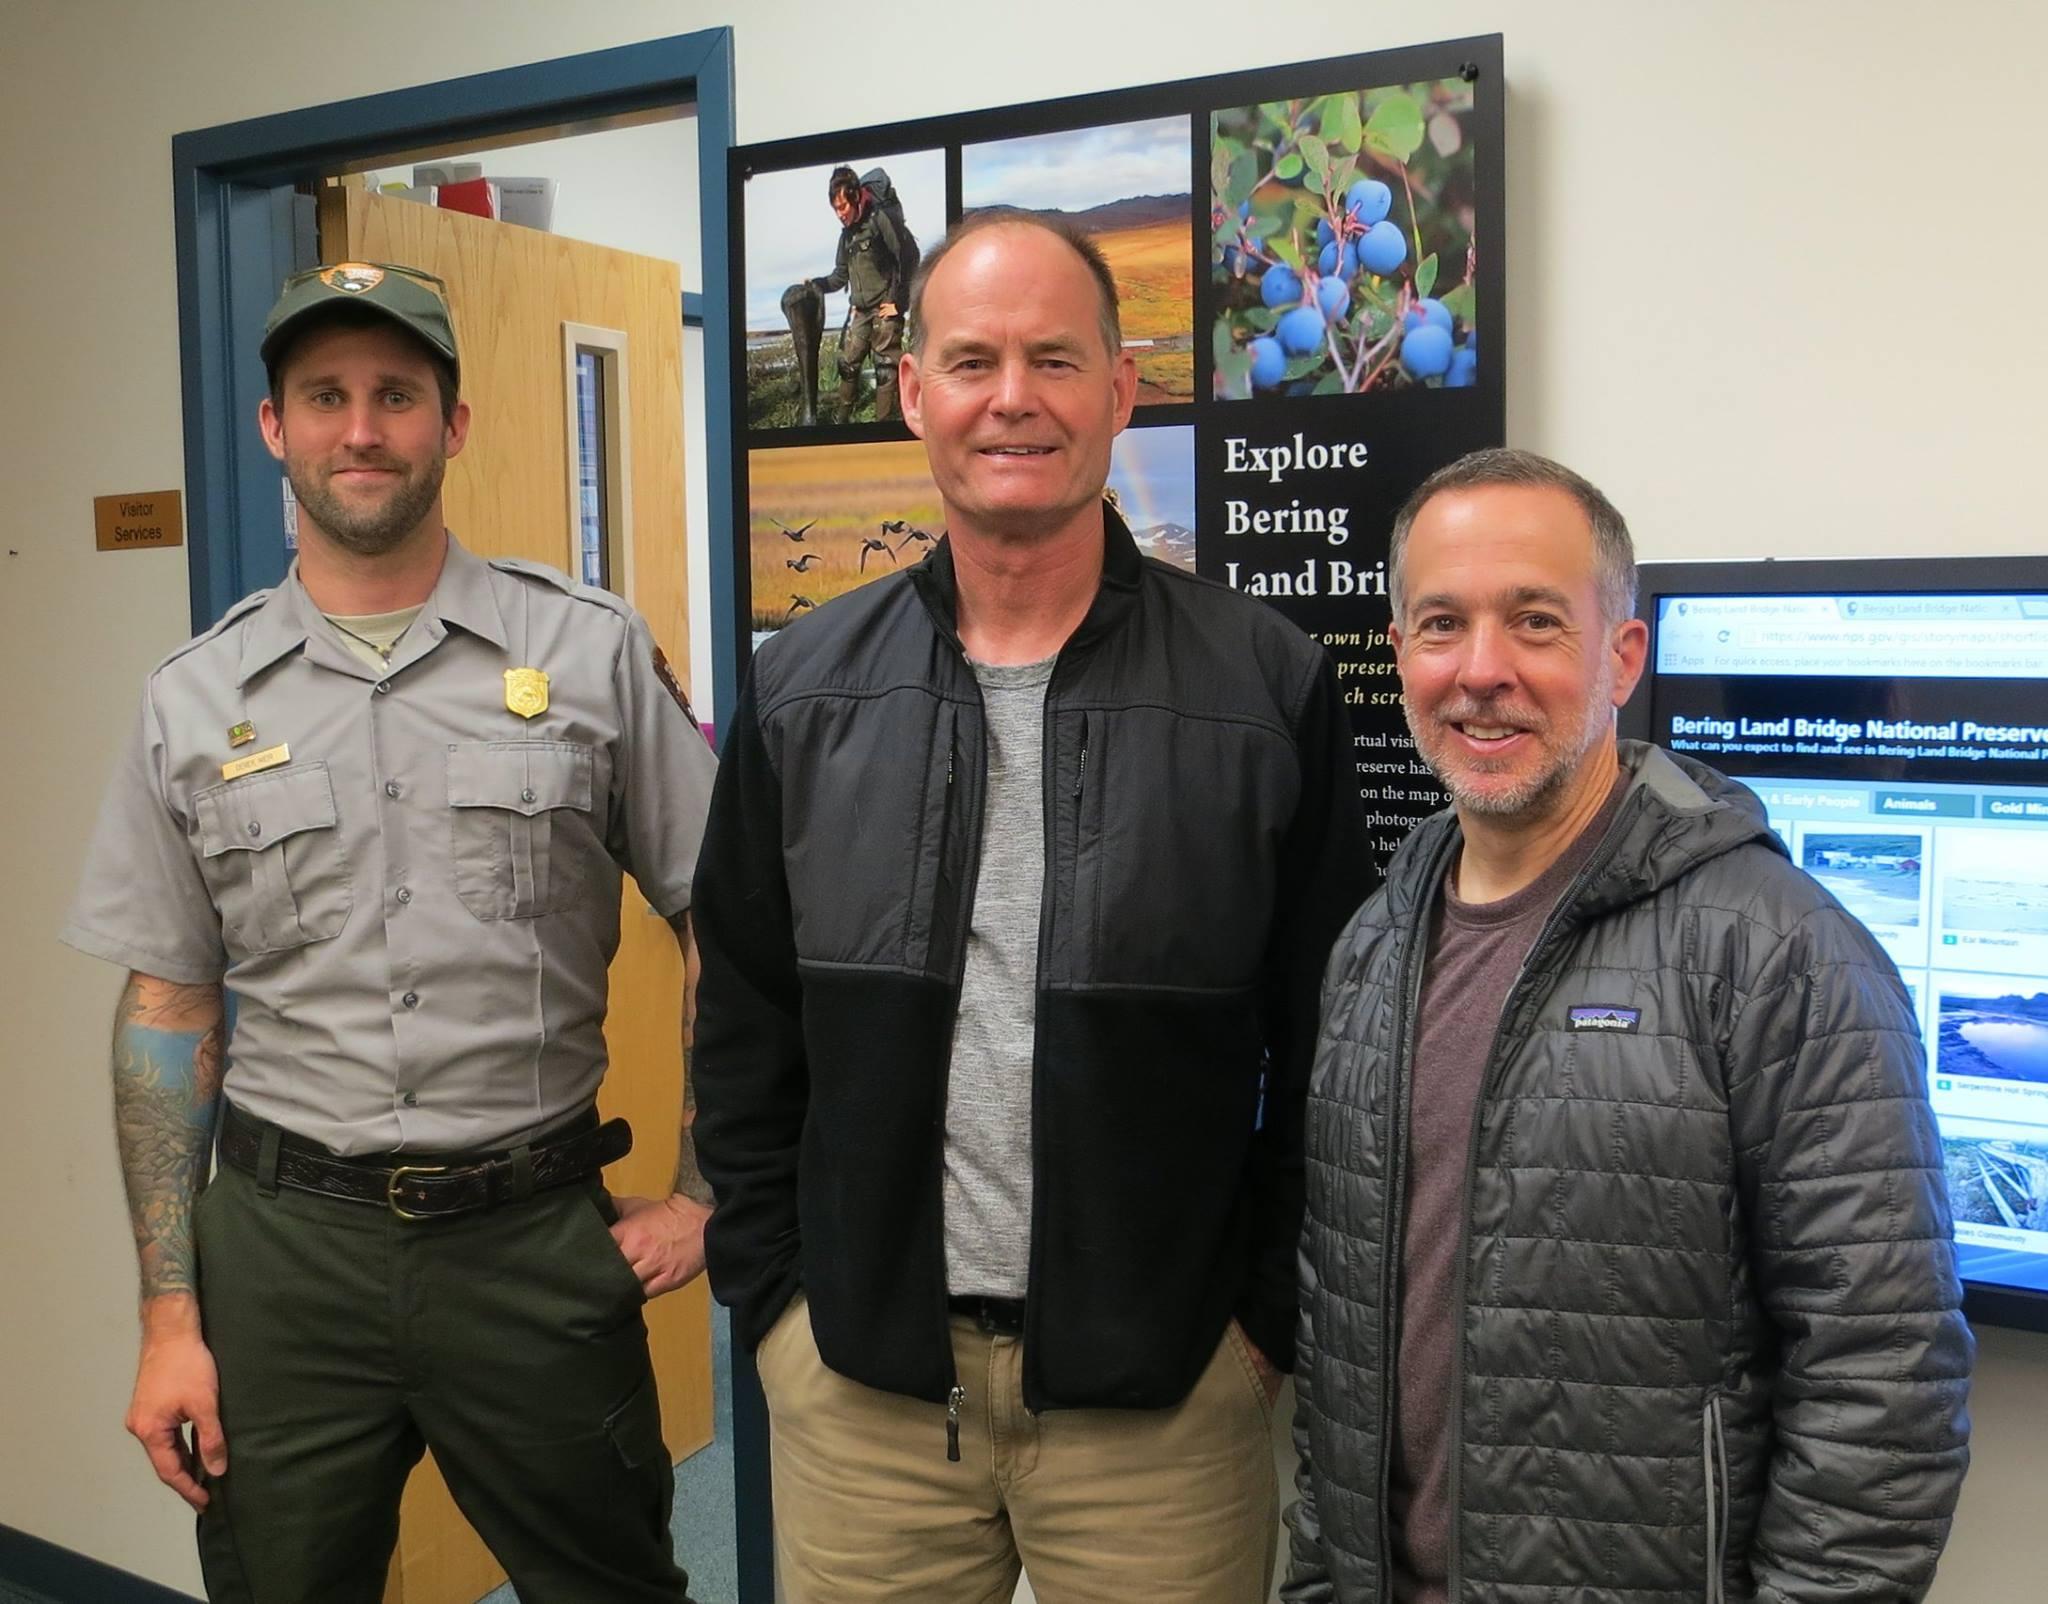 Derek Weir (NPS Ranger), Ron Horner (Band Director in Nome, AK) and Stephen Lias (Composer)